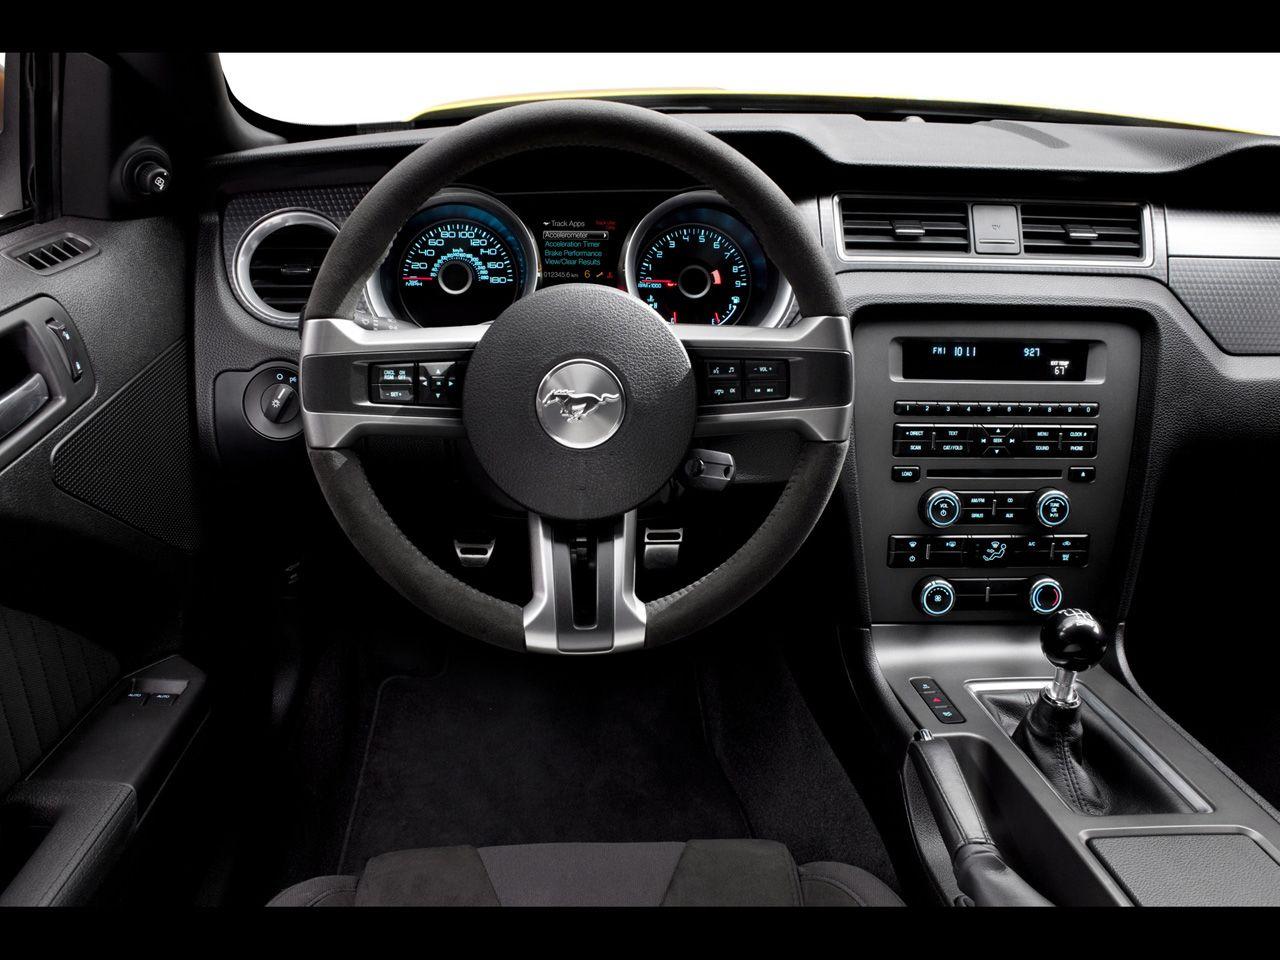 Ford Focus Ev Dashboard Wallpaper 3d Wallpapers Pinterest Pontiac Fiero